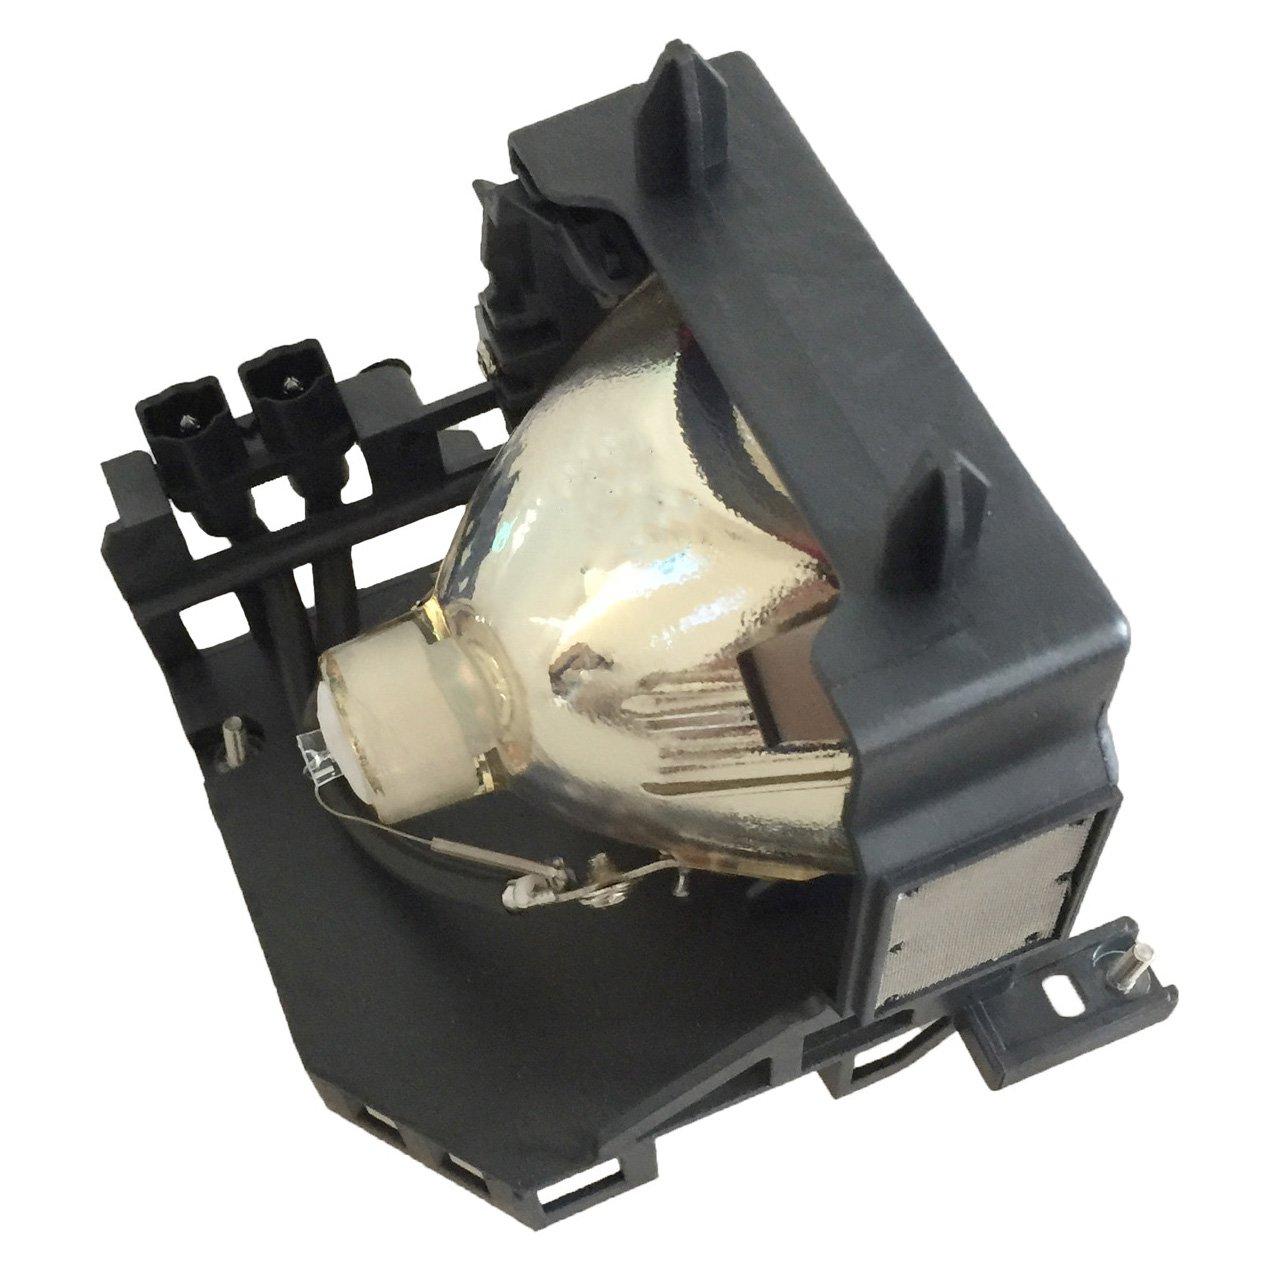 Litance Lmp H210 Replacement Lamp For Sony Vpl Hw45es Electric Circuit Hw65es Vw65es Projectors Home Audio Theater